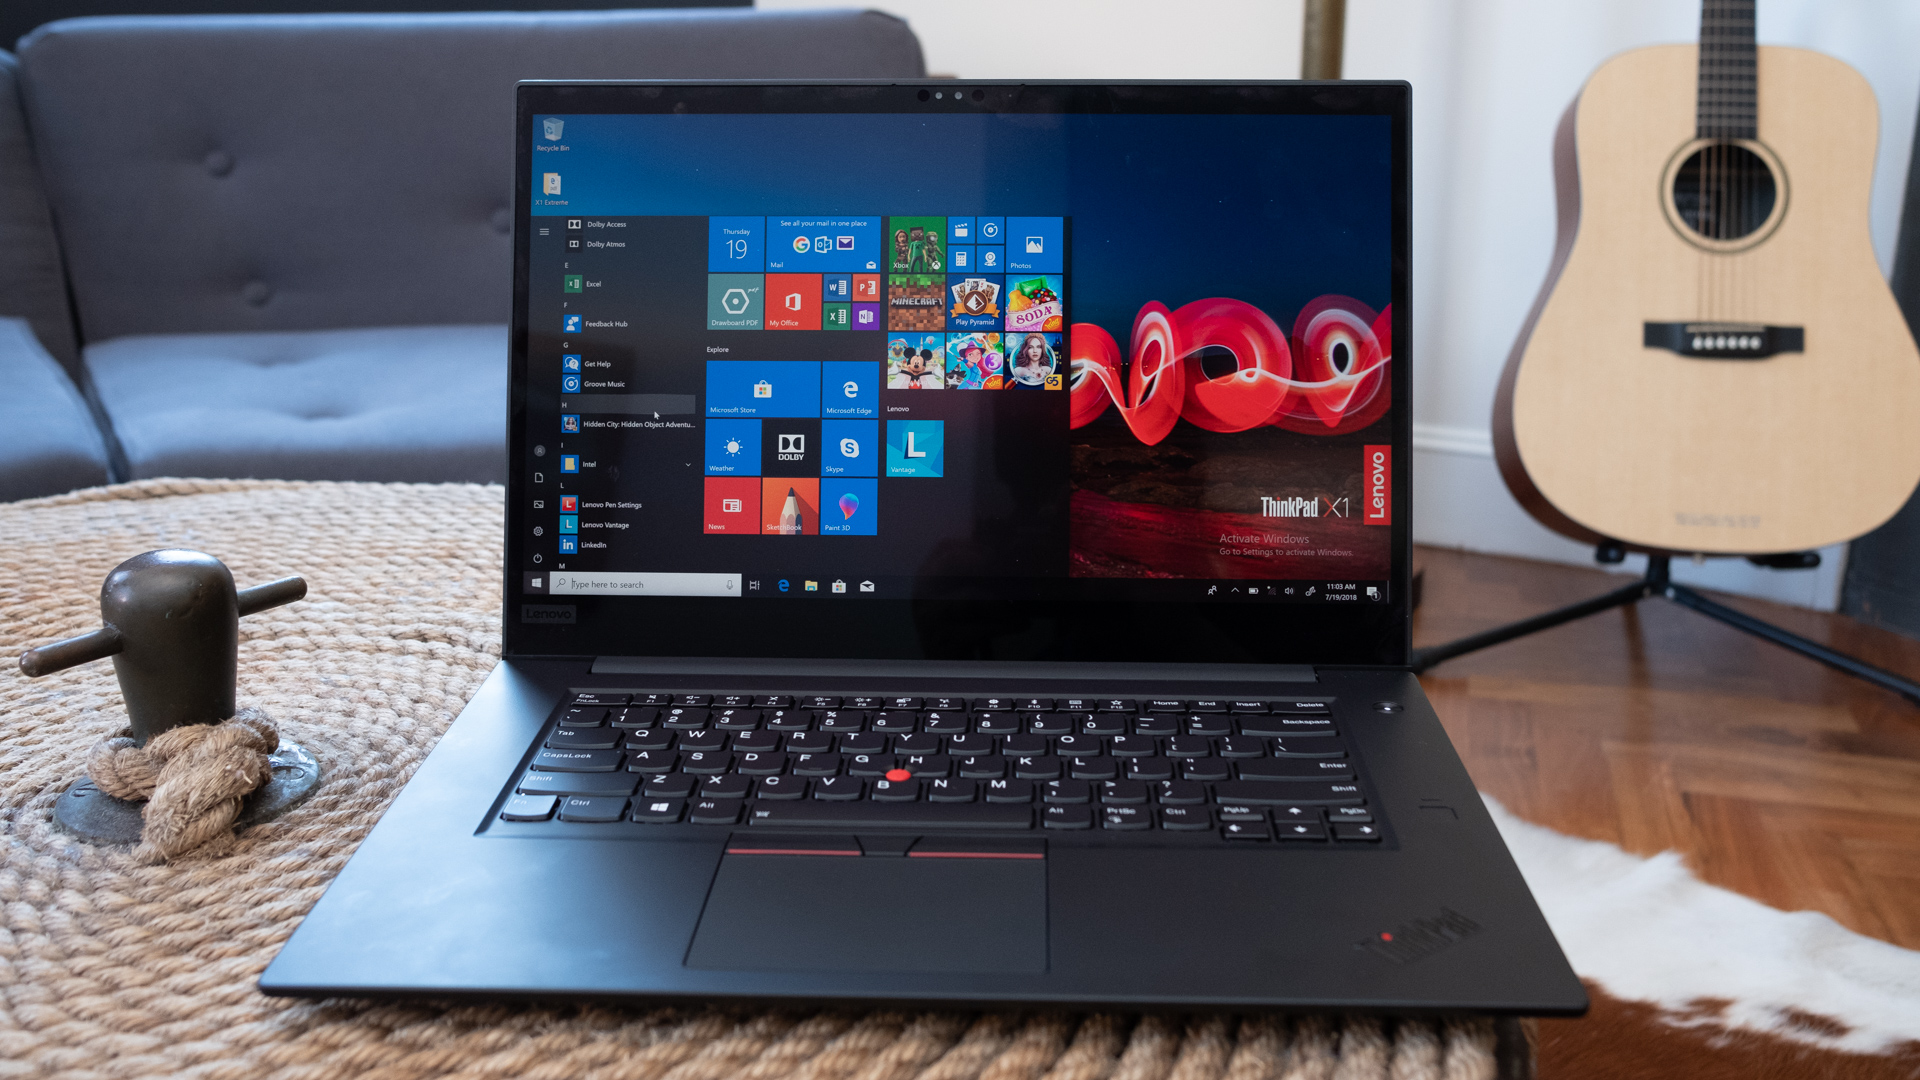 ThinkPad X1 Extreme Mobile Workstation